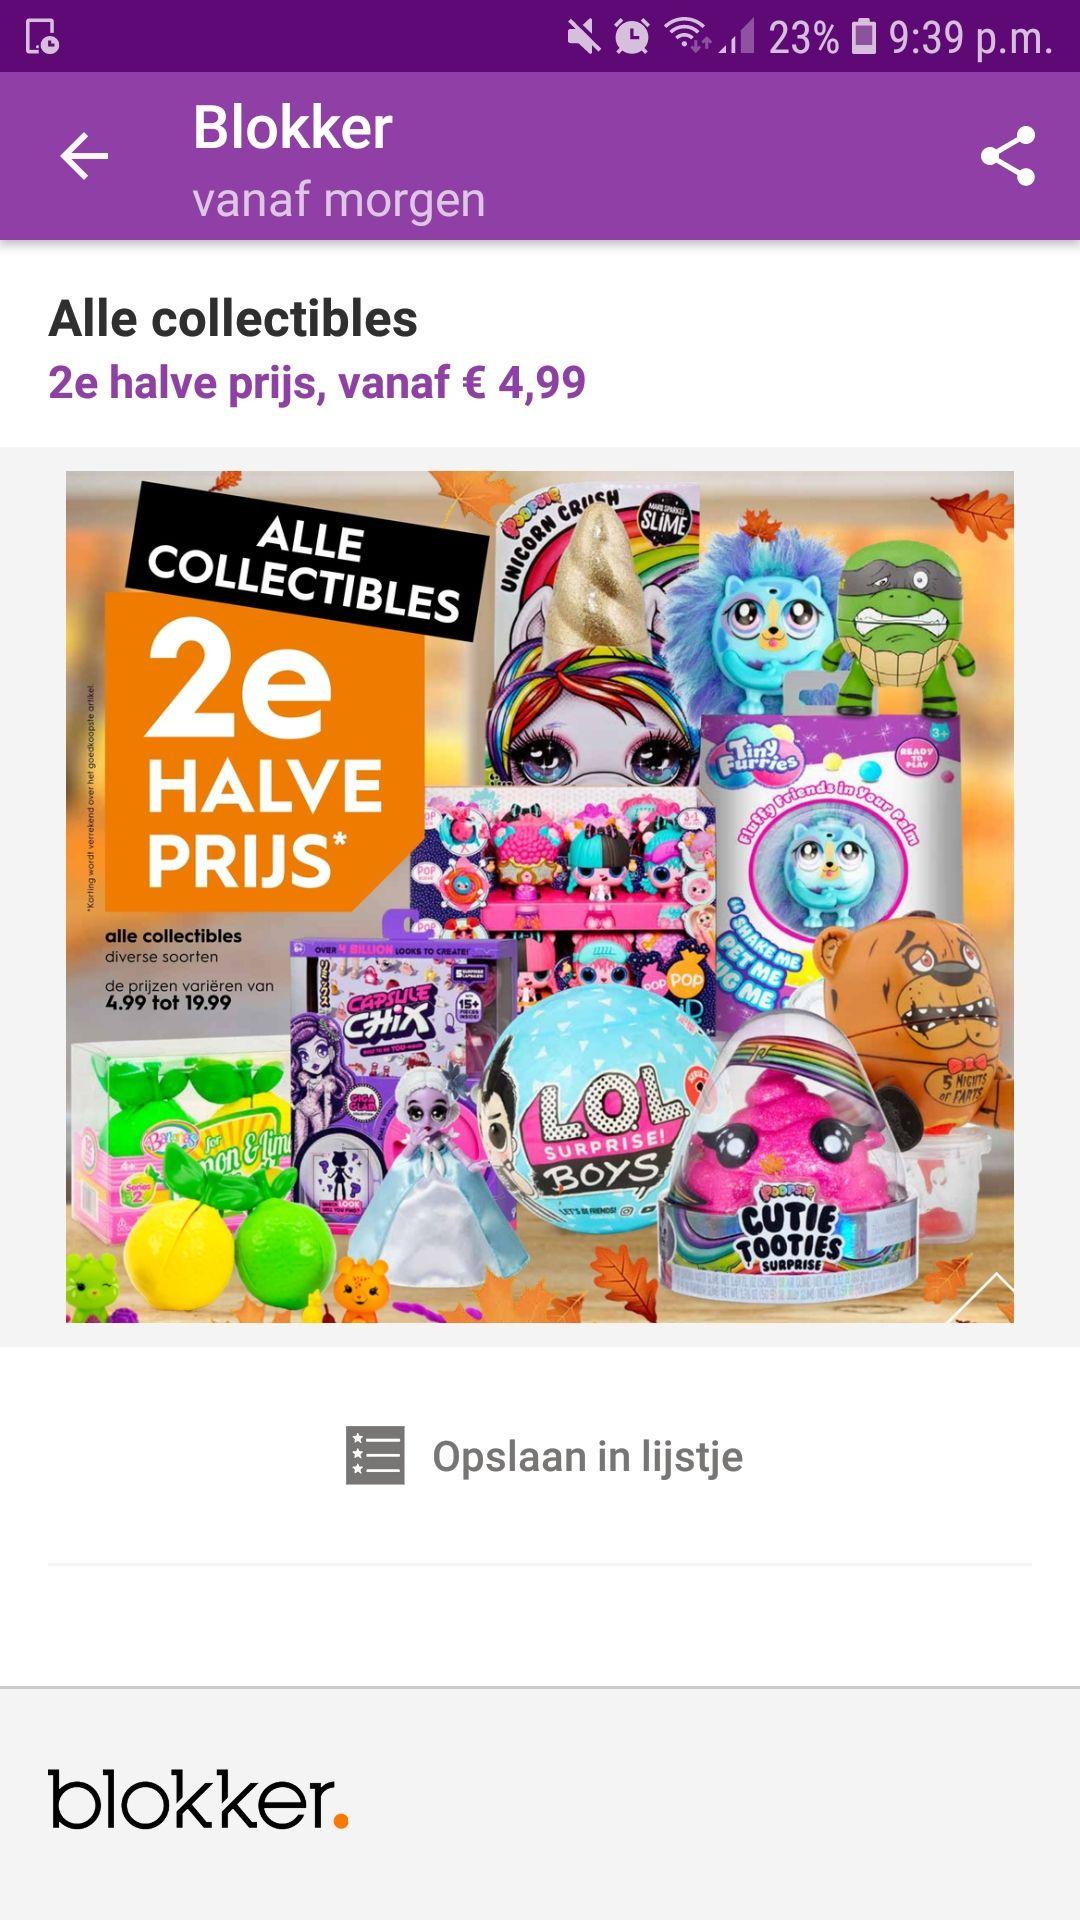 LOL surprise en andere collectibles 2e halve prijs